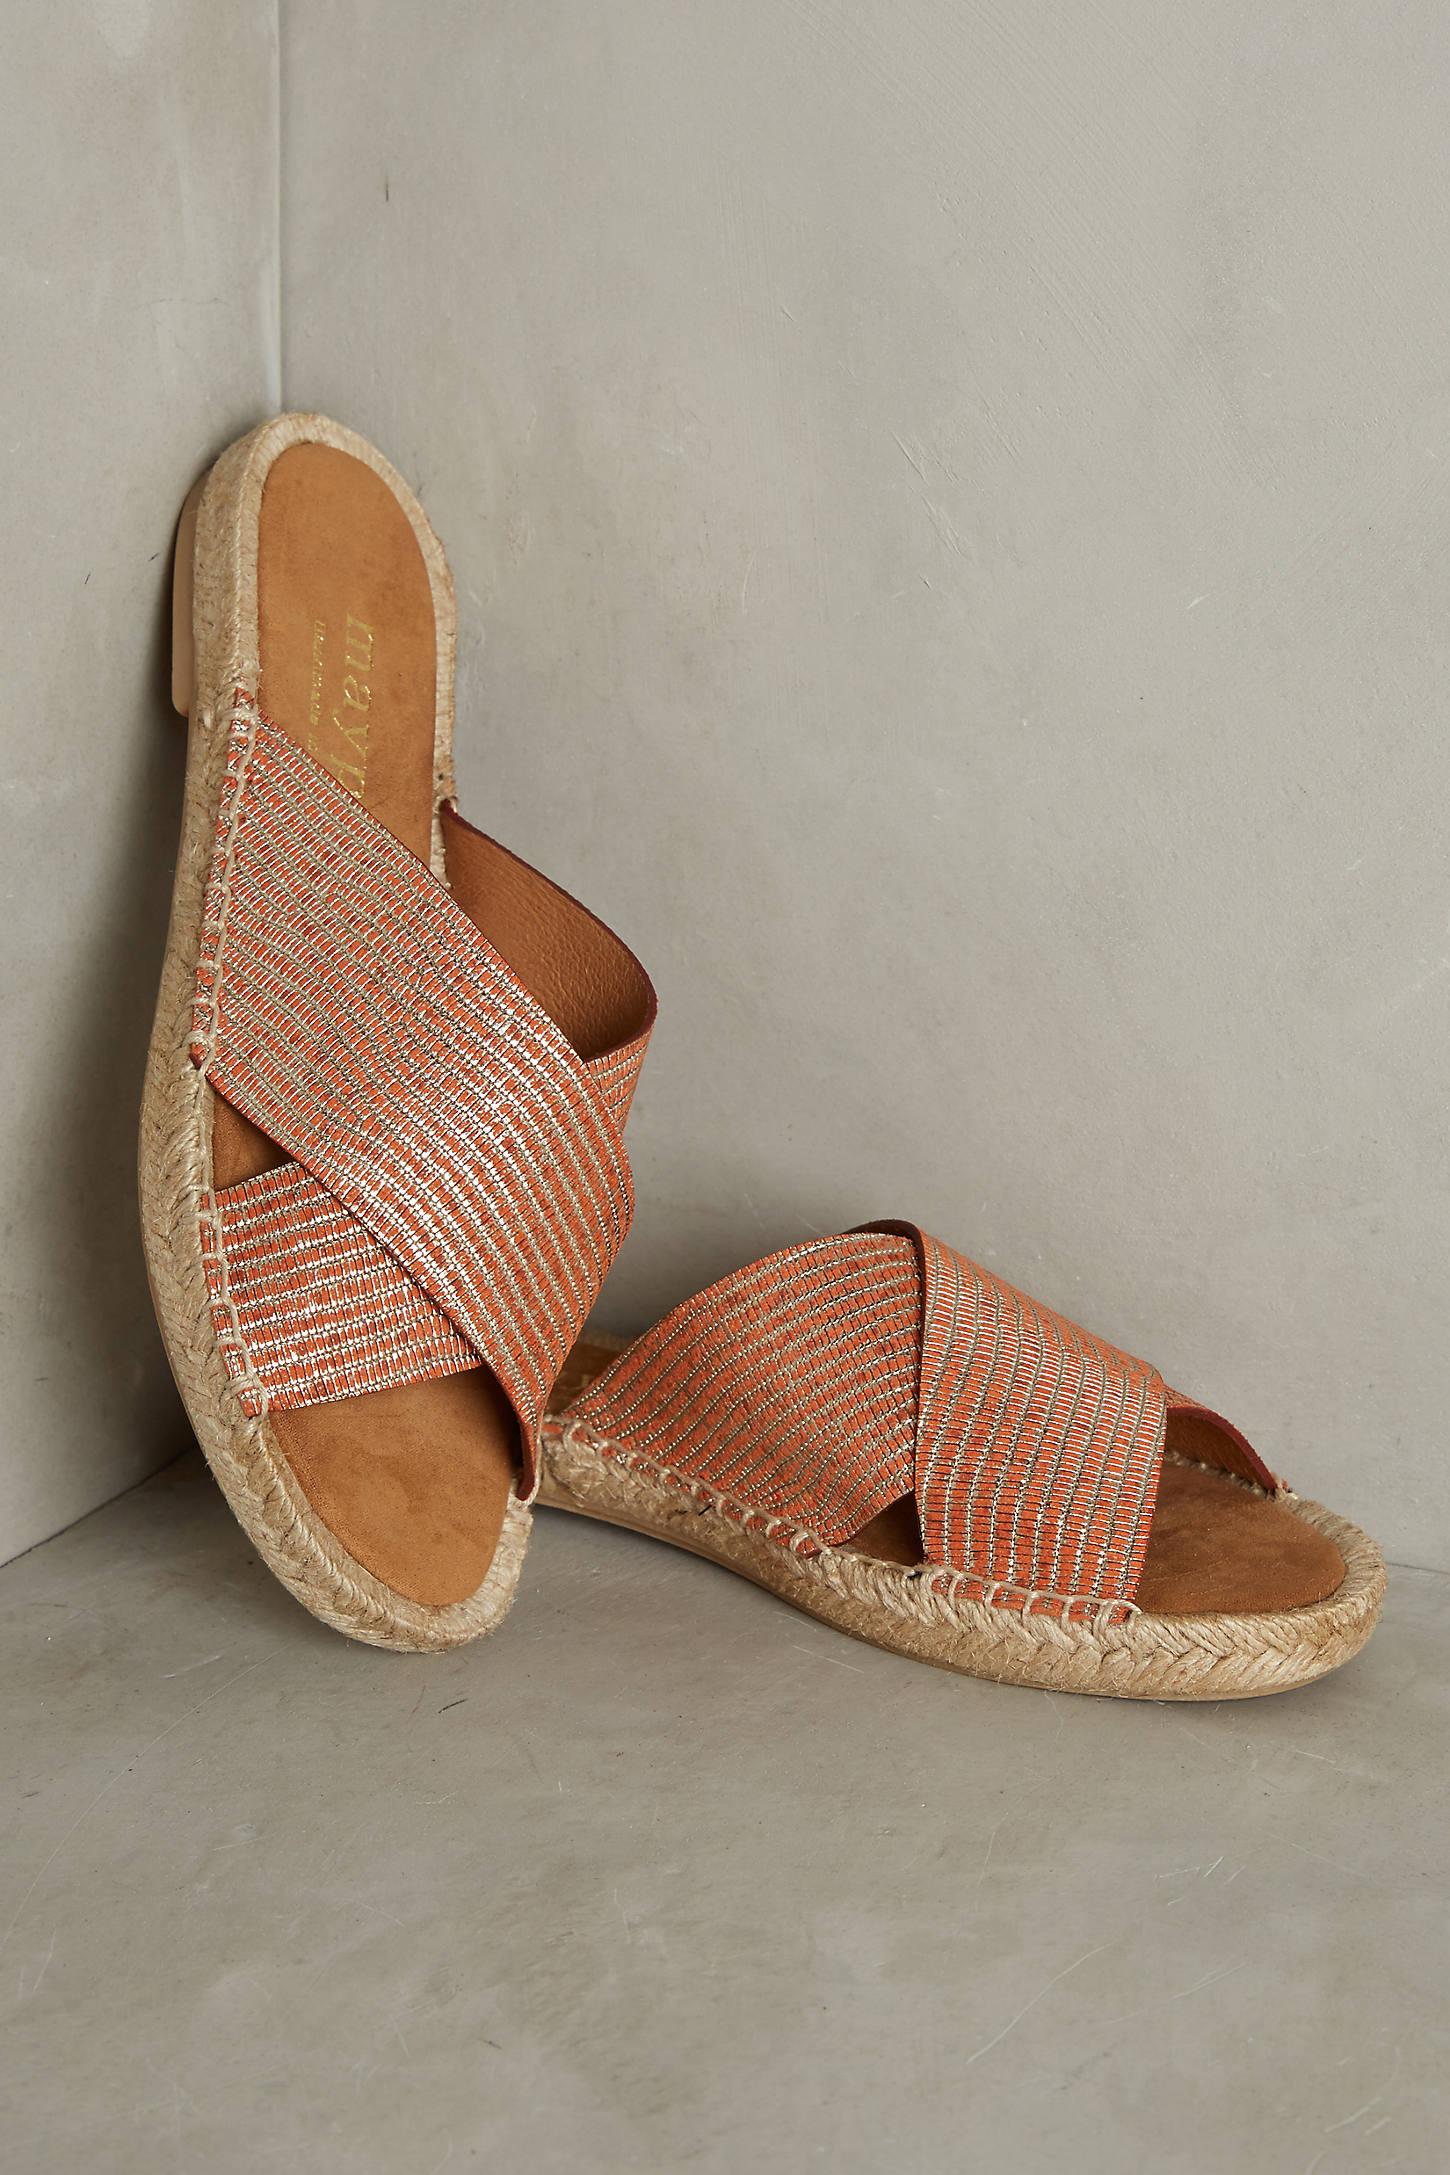 Maypol Metallic Espadrille Sandals